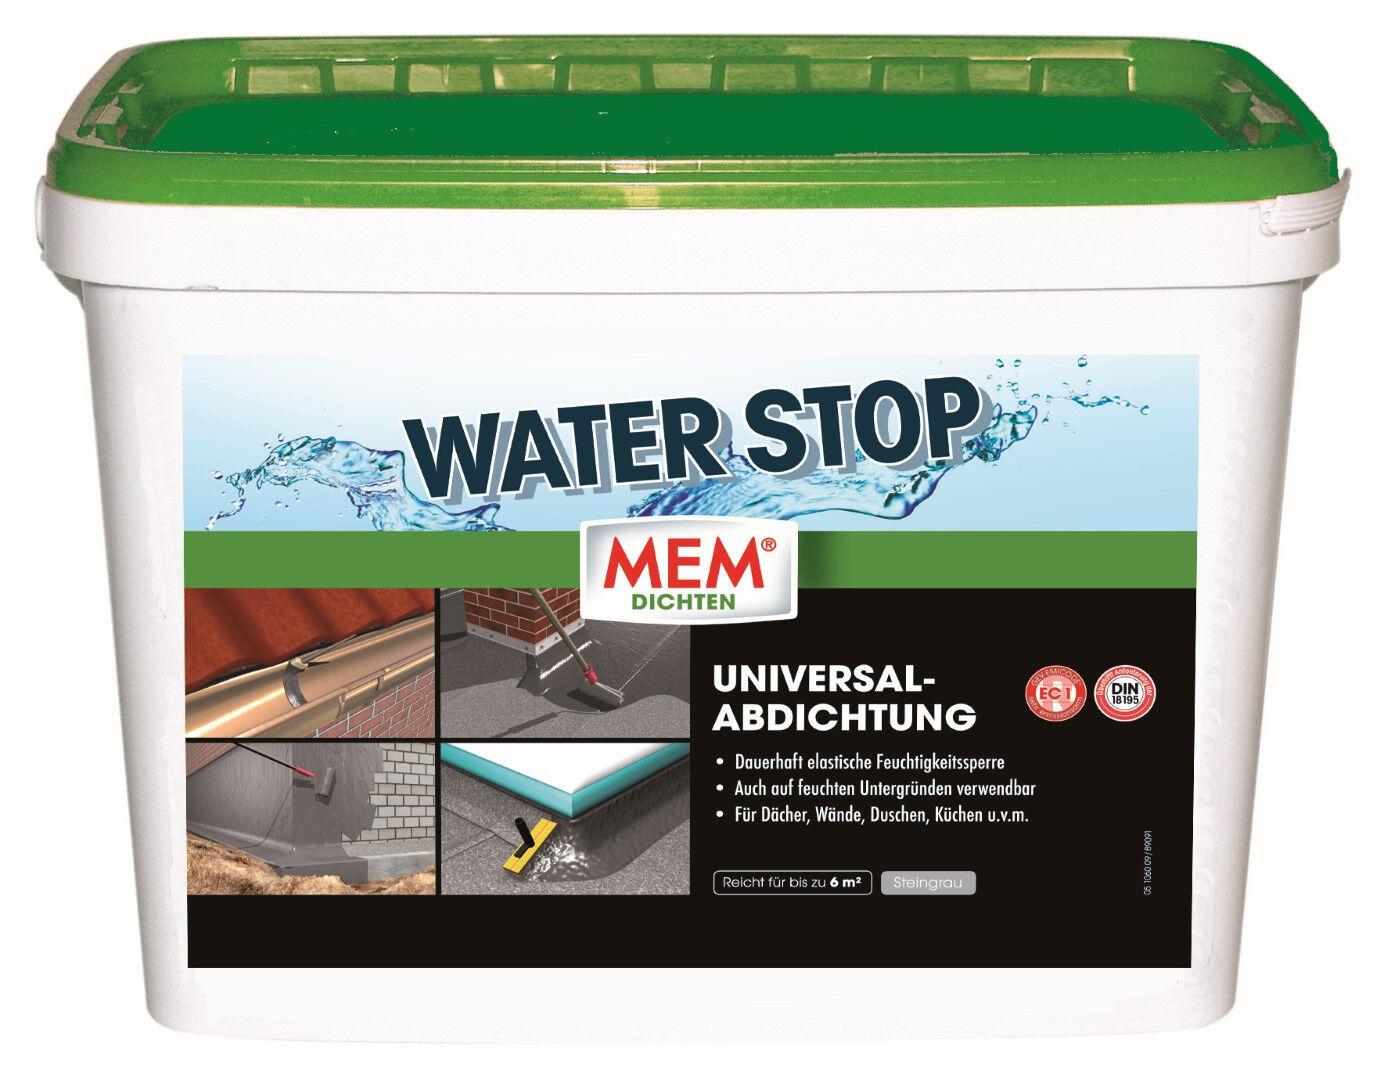 MEM Water Stop 14 kg Wasserstop Wandabdichtung